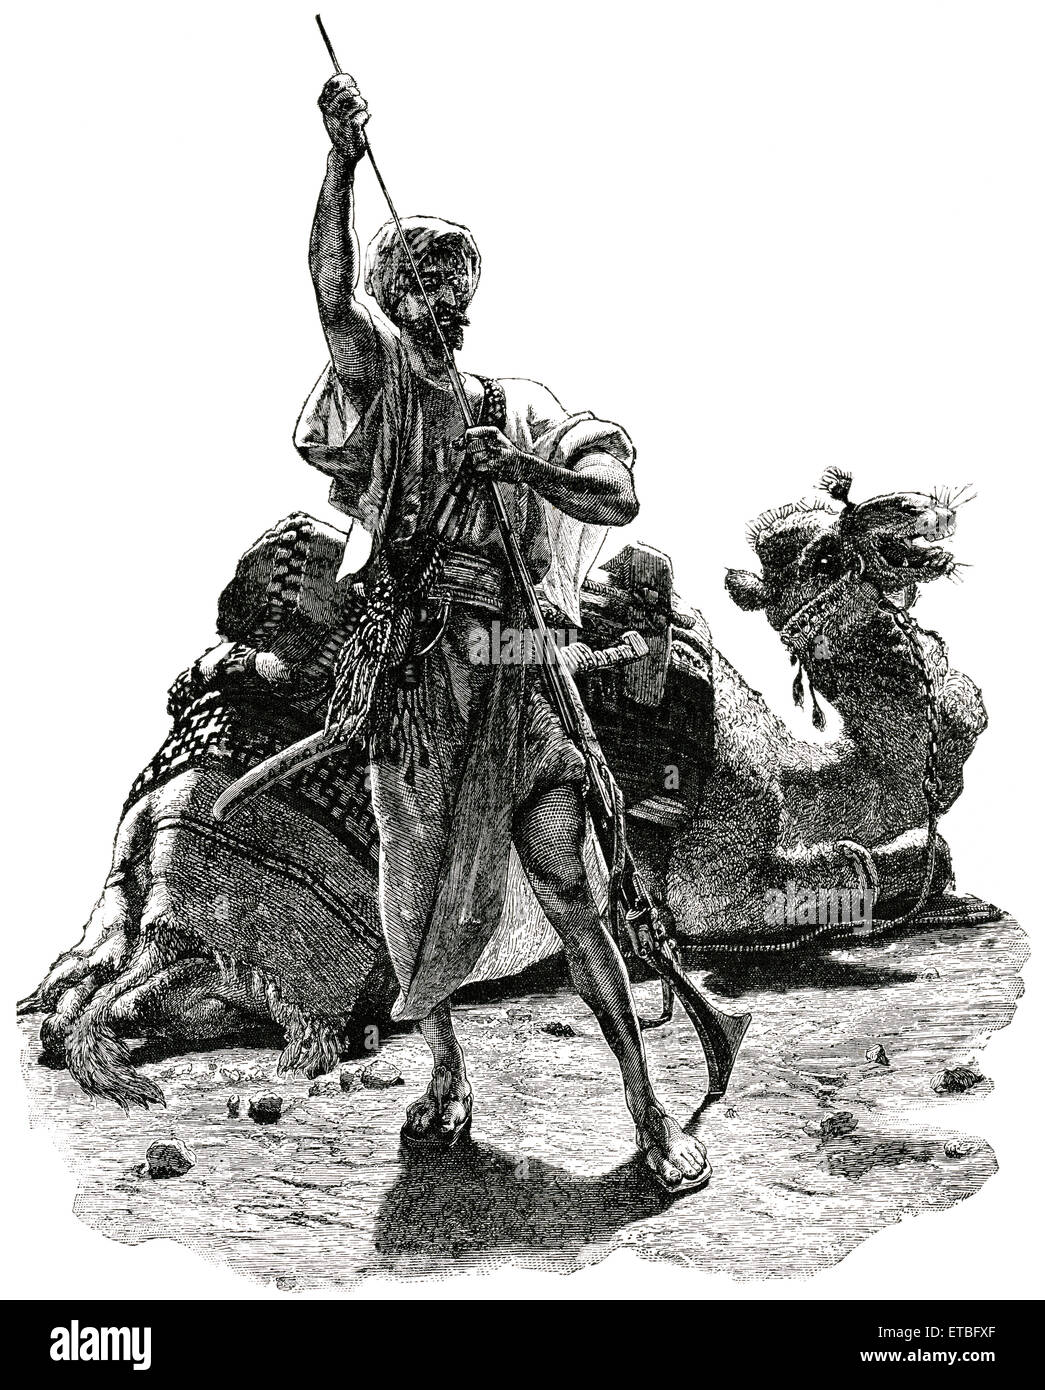 Arab Man in Desert Preparing to Meet Approaching Foe, Arabia, 'Classical Portfolio of Primitive Carriers', - Stock Image